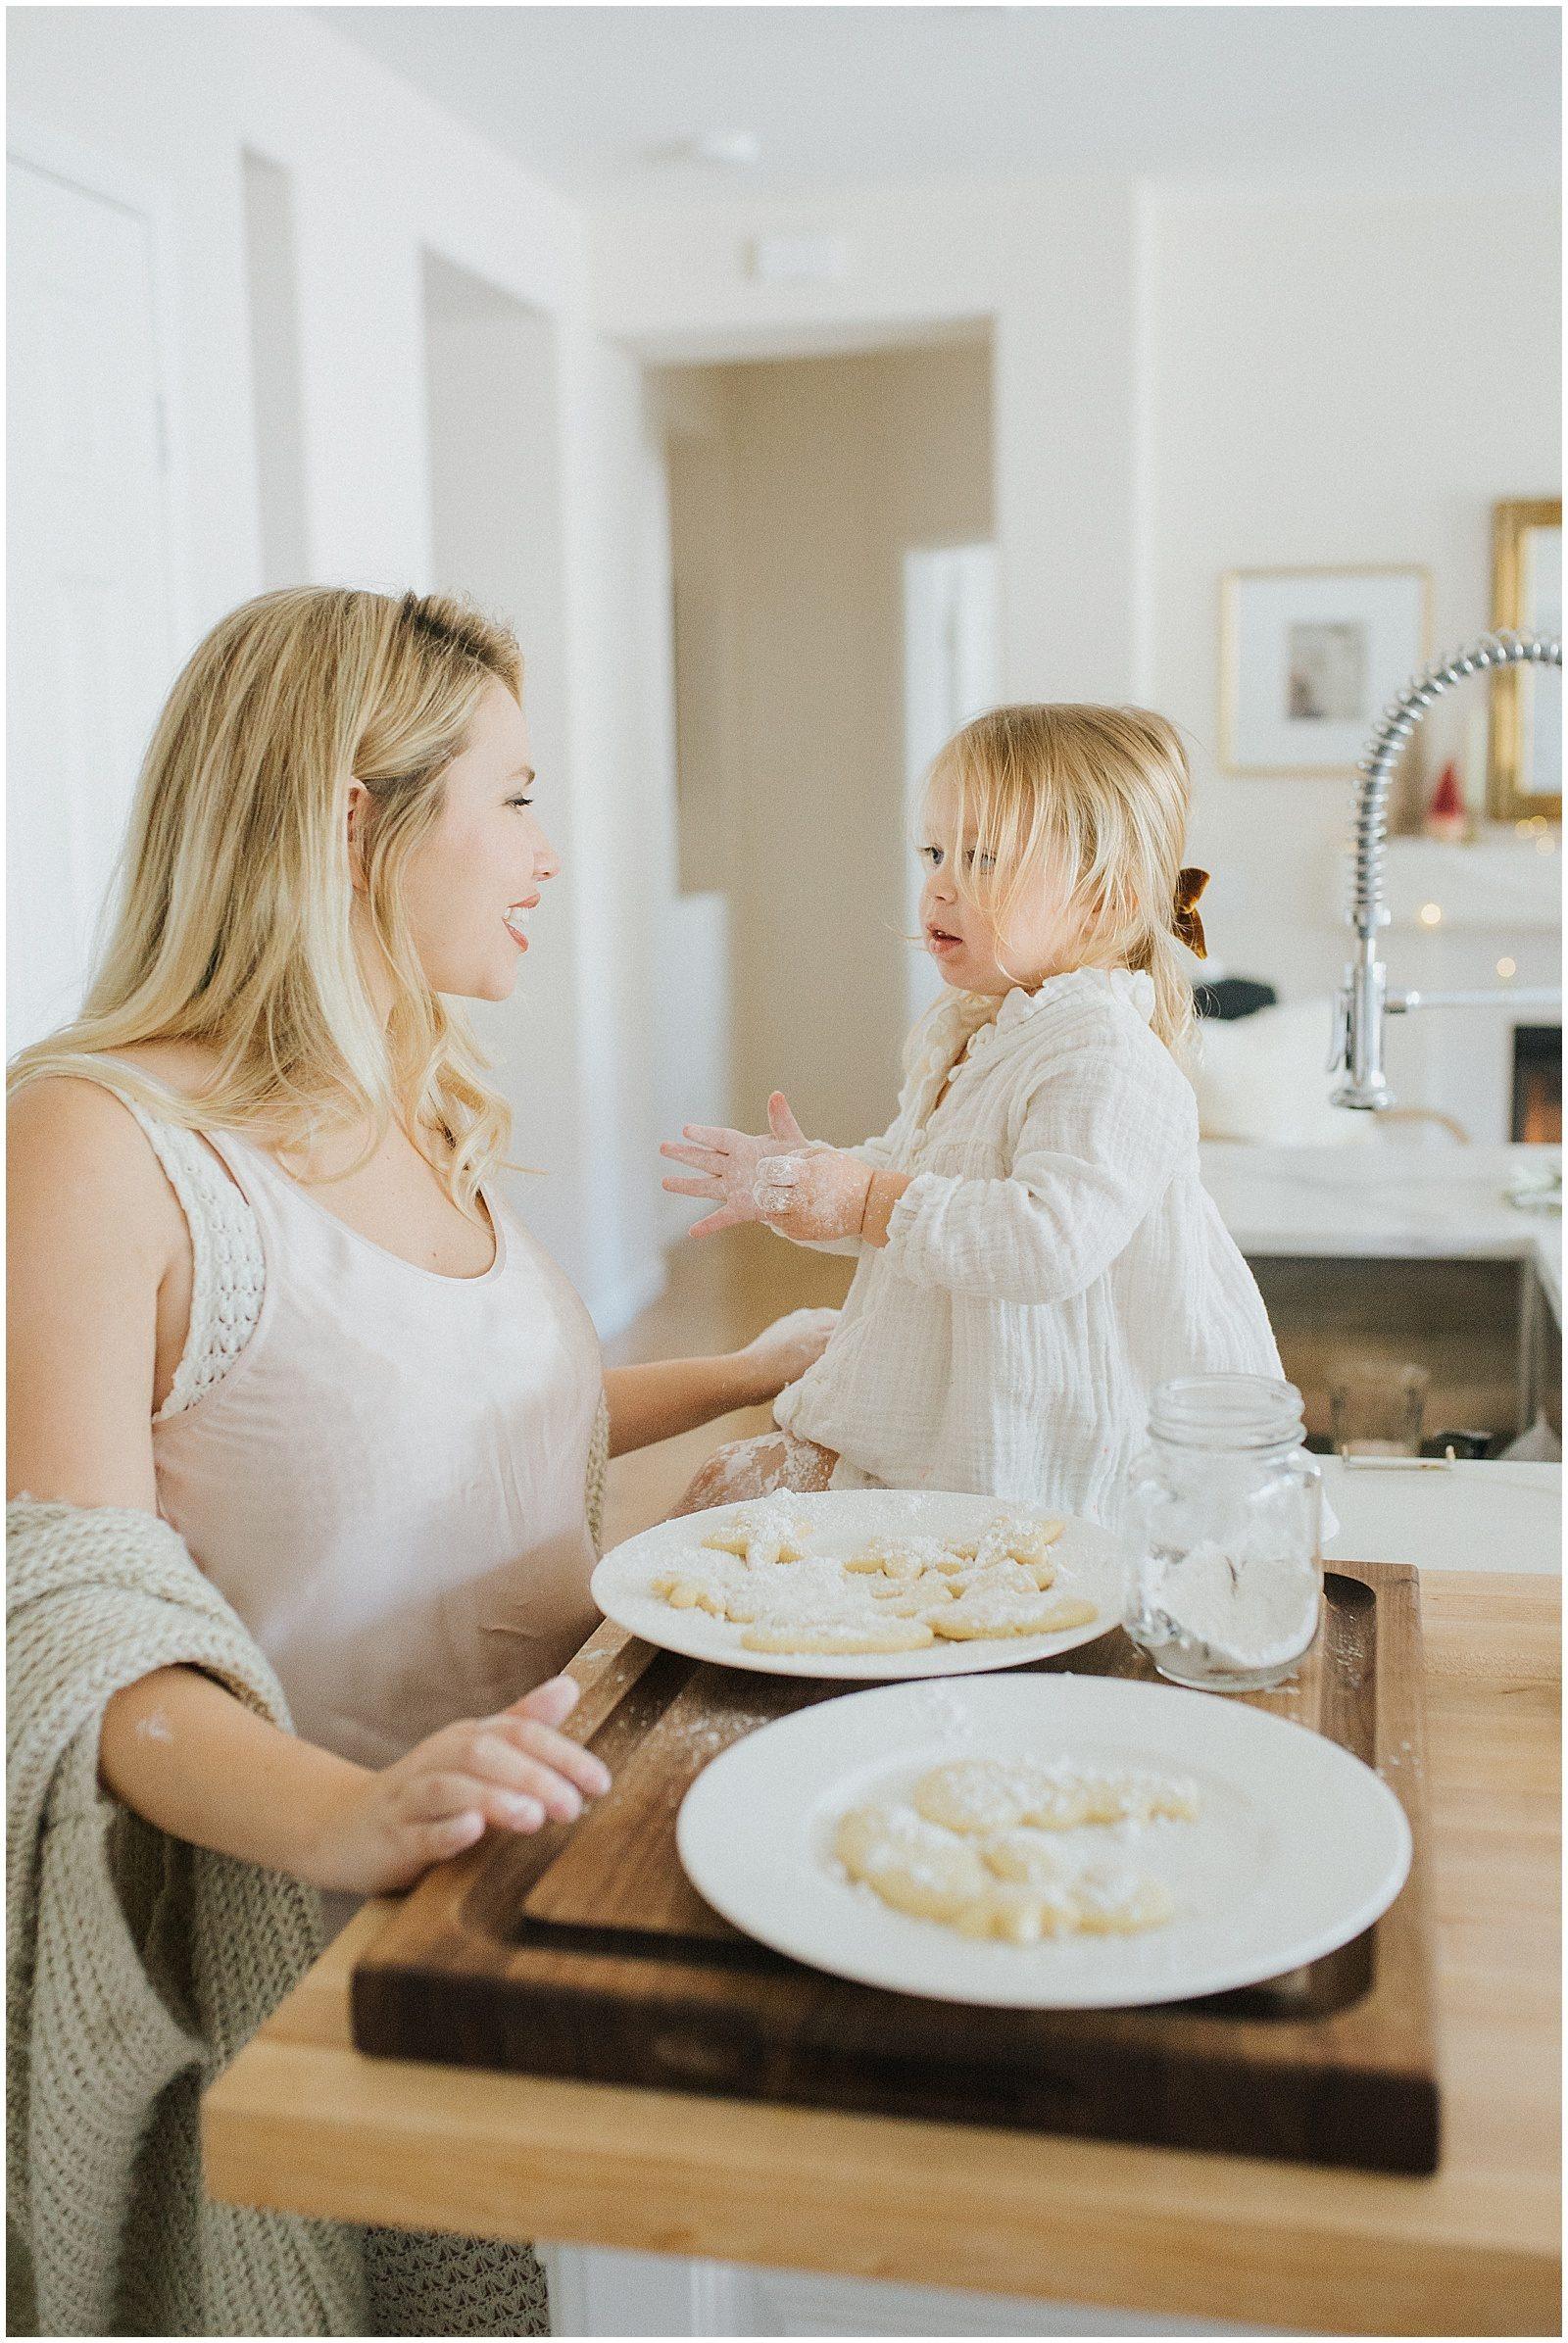 Orange County Family Lifestyle Photographer Sonja Hammad Photography 0133